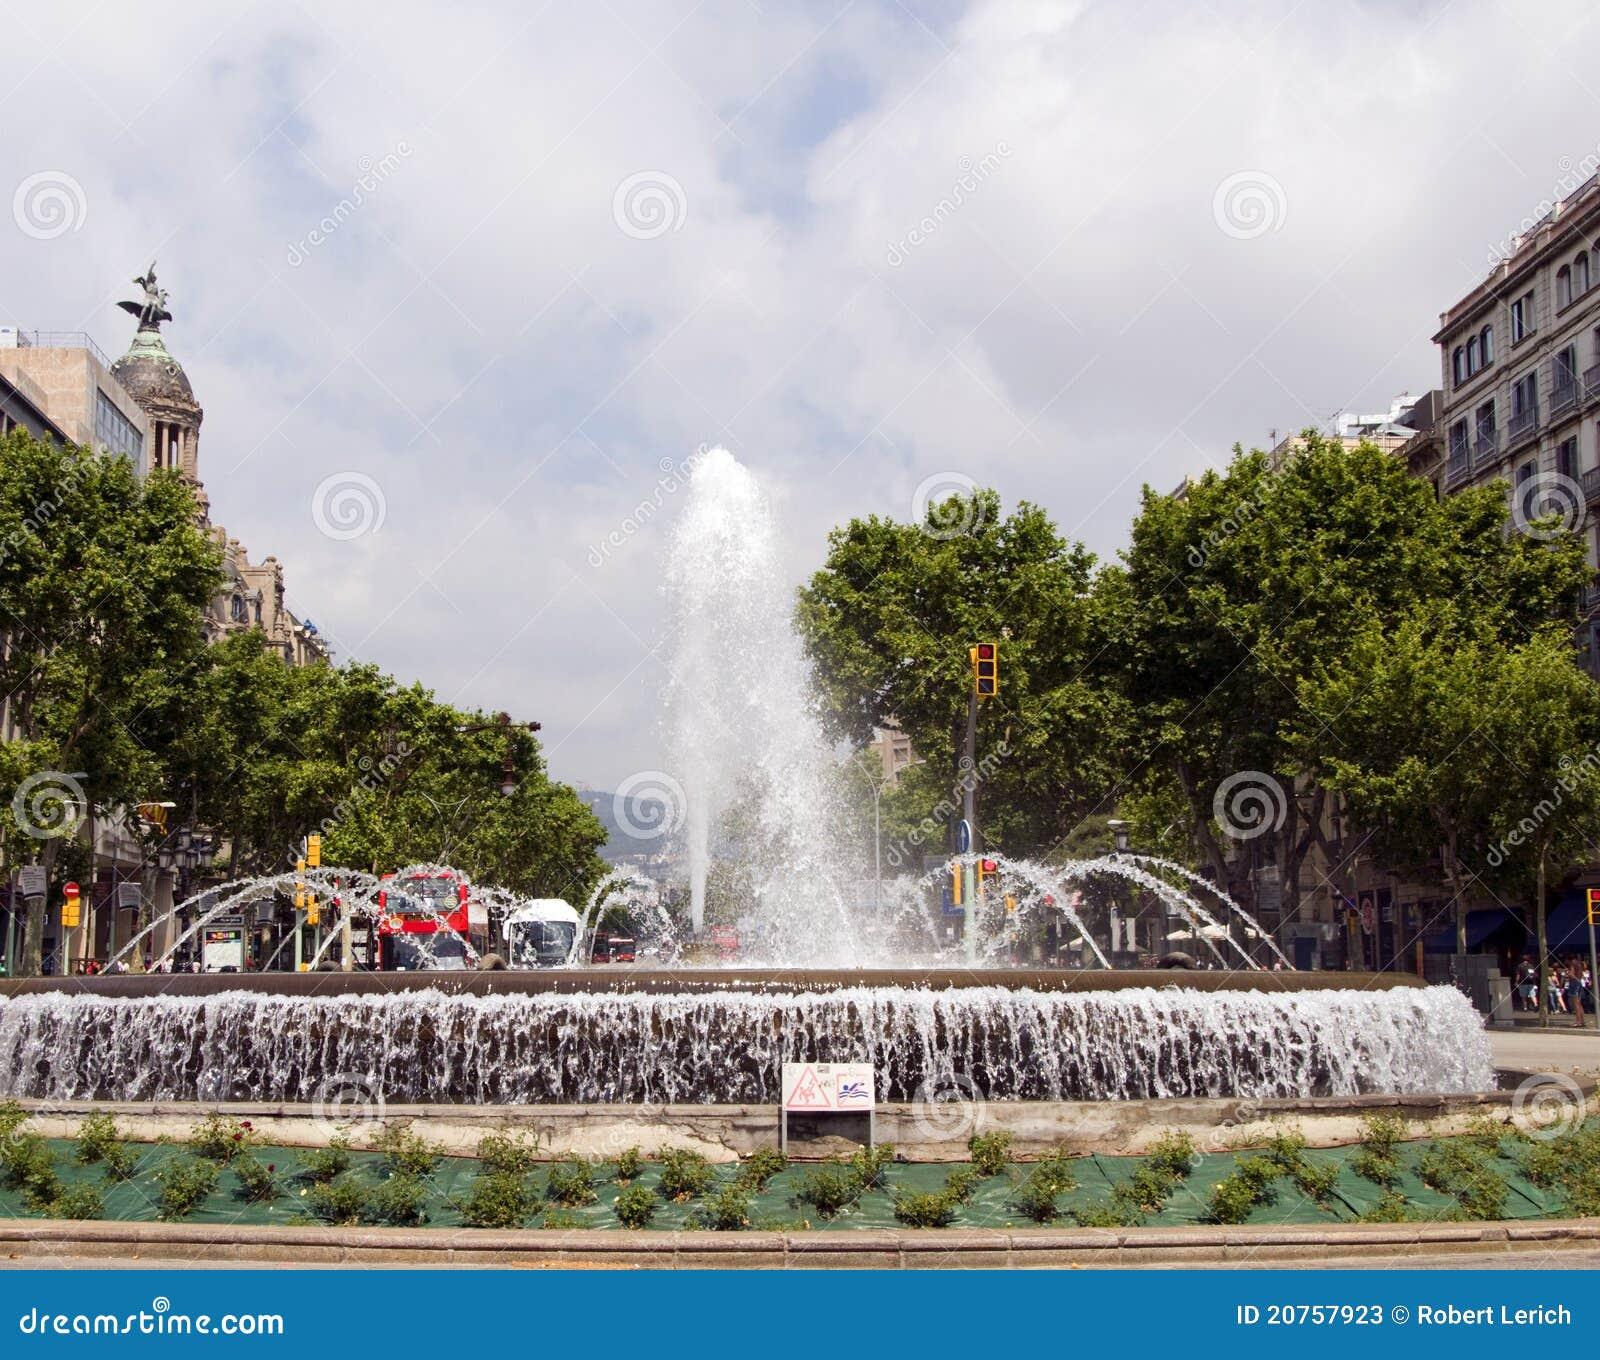 fountain gran via barcelona spain stock photos image 20757923. Black Bedroom Furniture Sets. Home Design Ideas